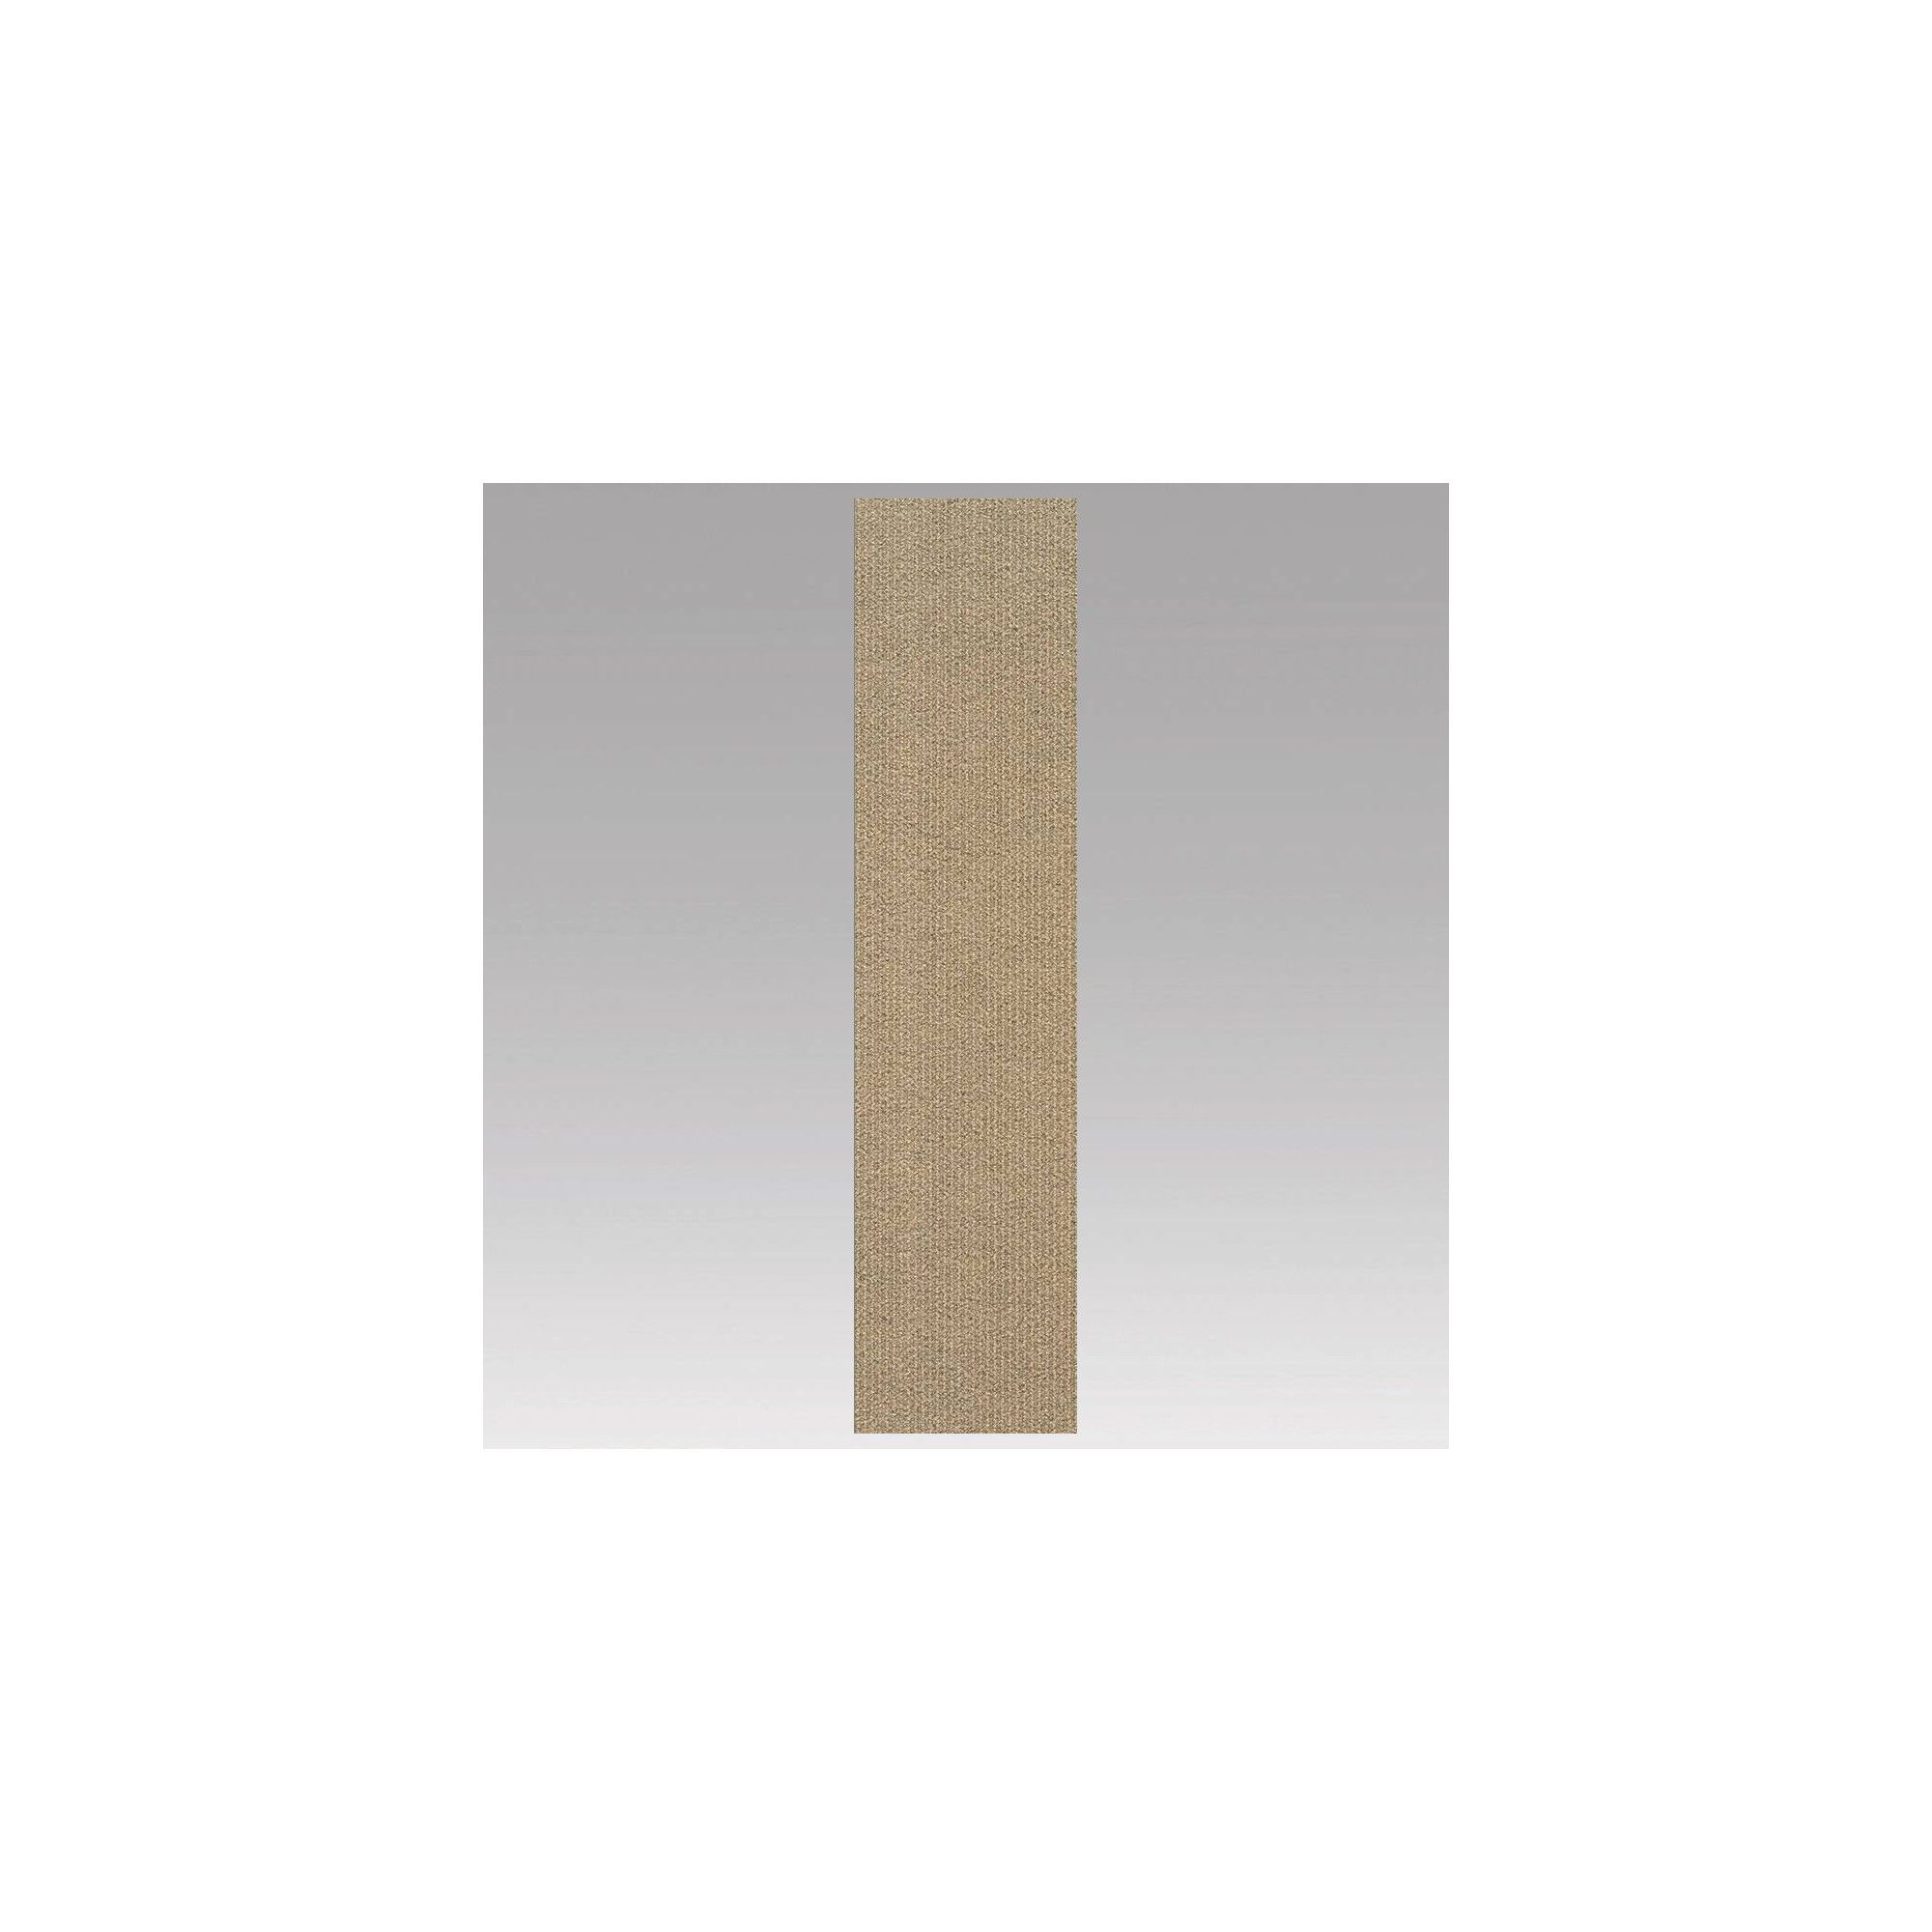 9x36 16pk Self Stick Carpet Tile Brown  Foss Floors Adult Unisex Size 1x3 9x36 16pk Self Stick Carpet Tile Brown  Foss Floors